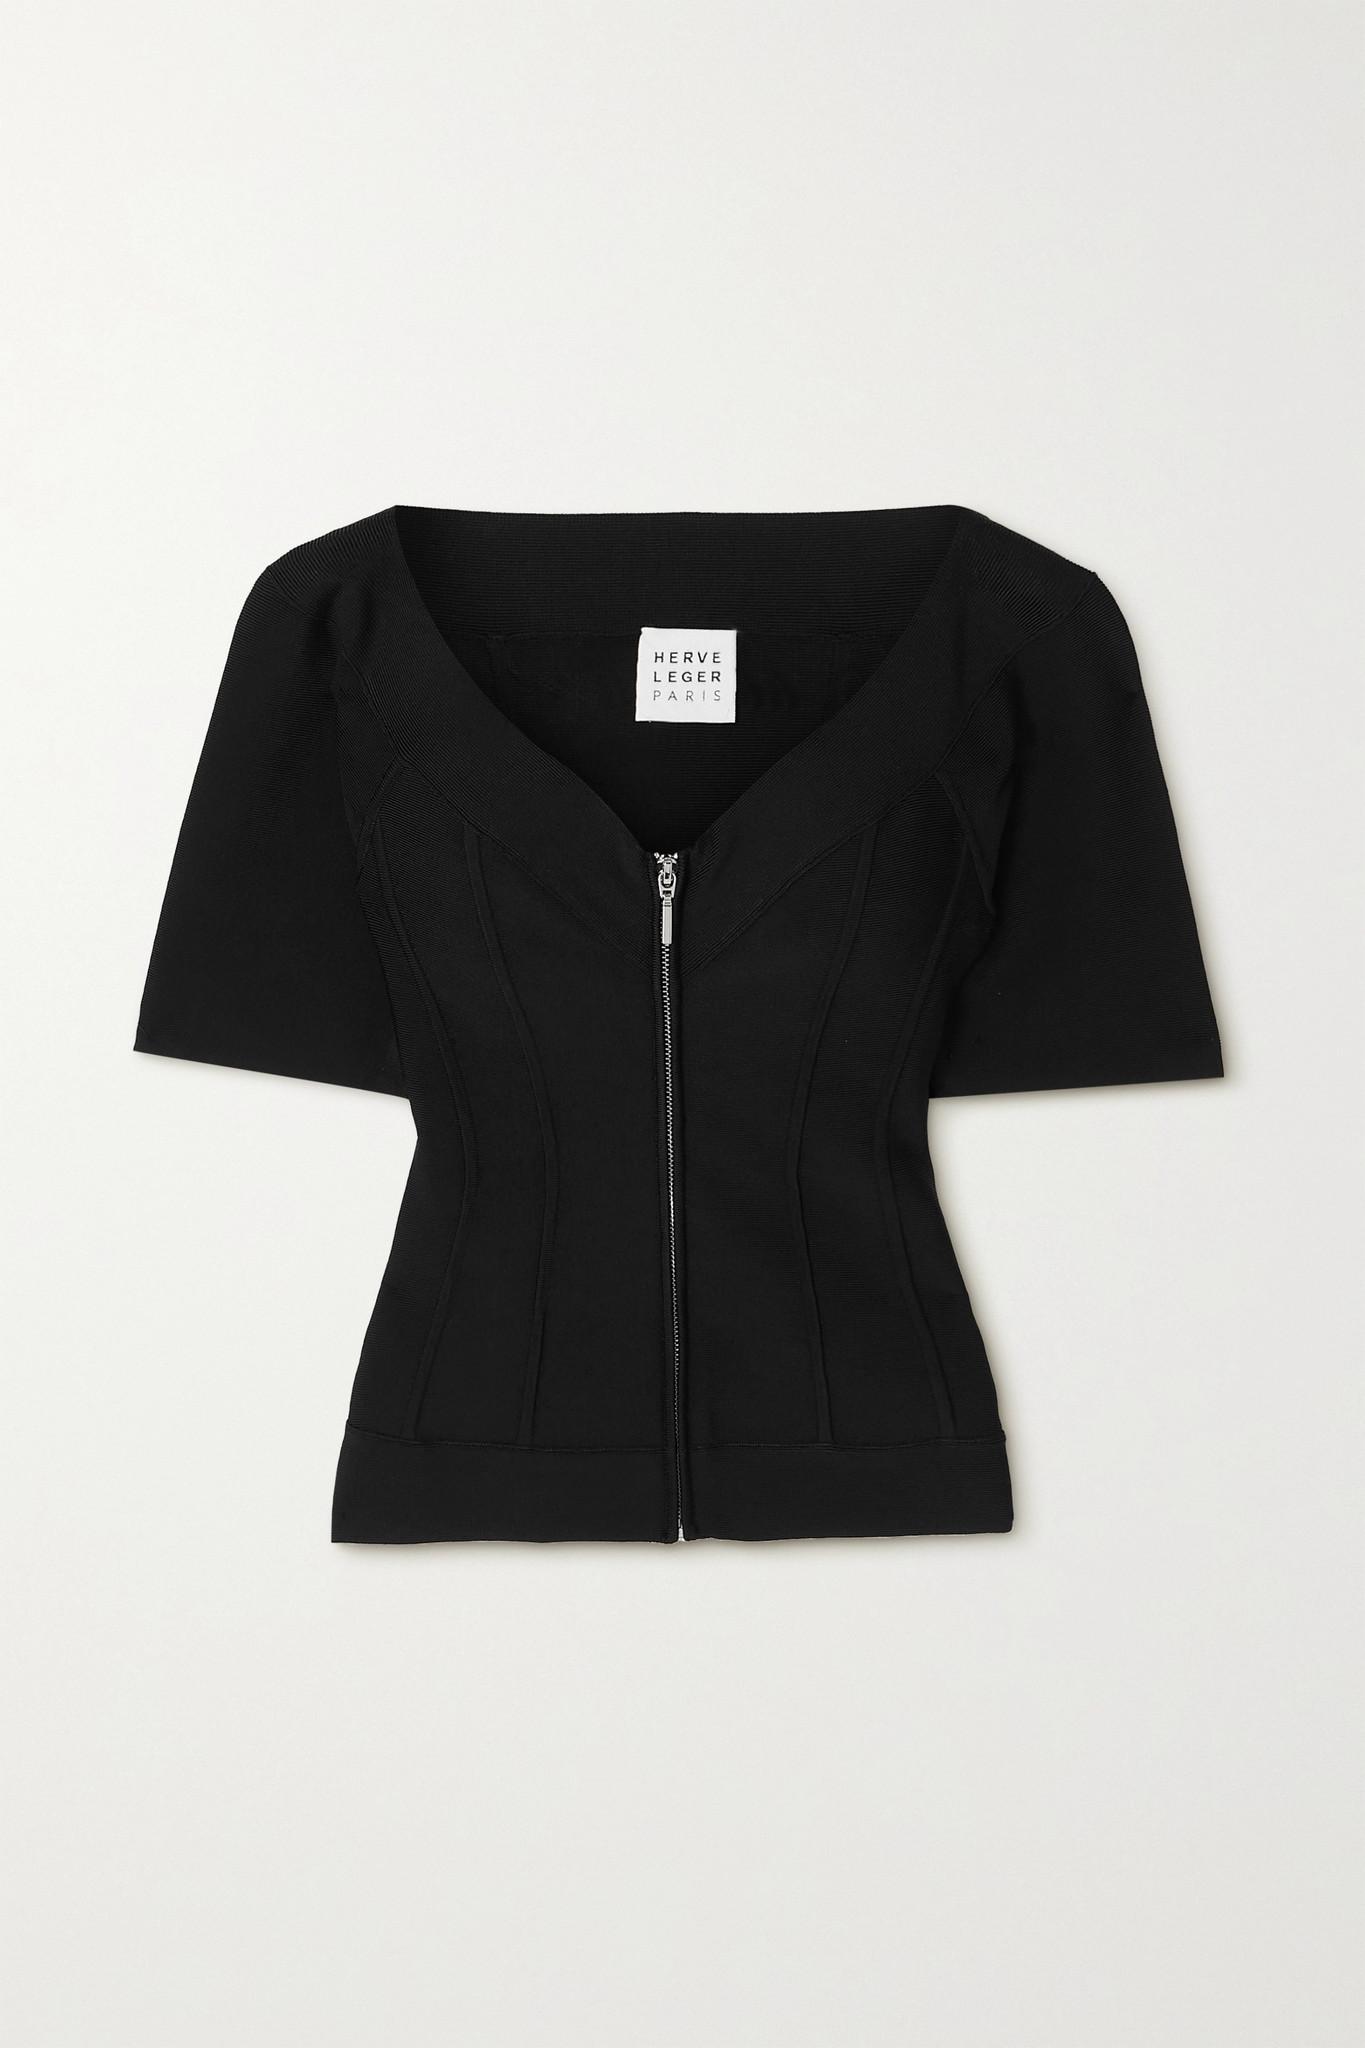 HERVÉ LÉGER - 绷带外套 - 黑色 - medium